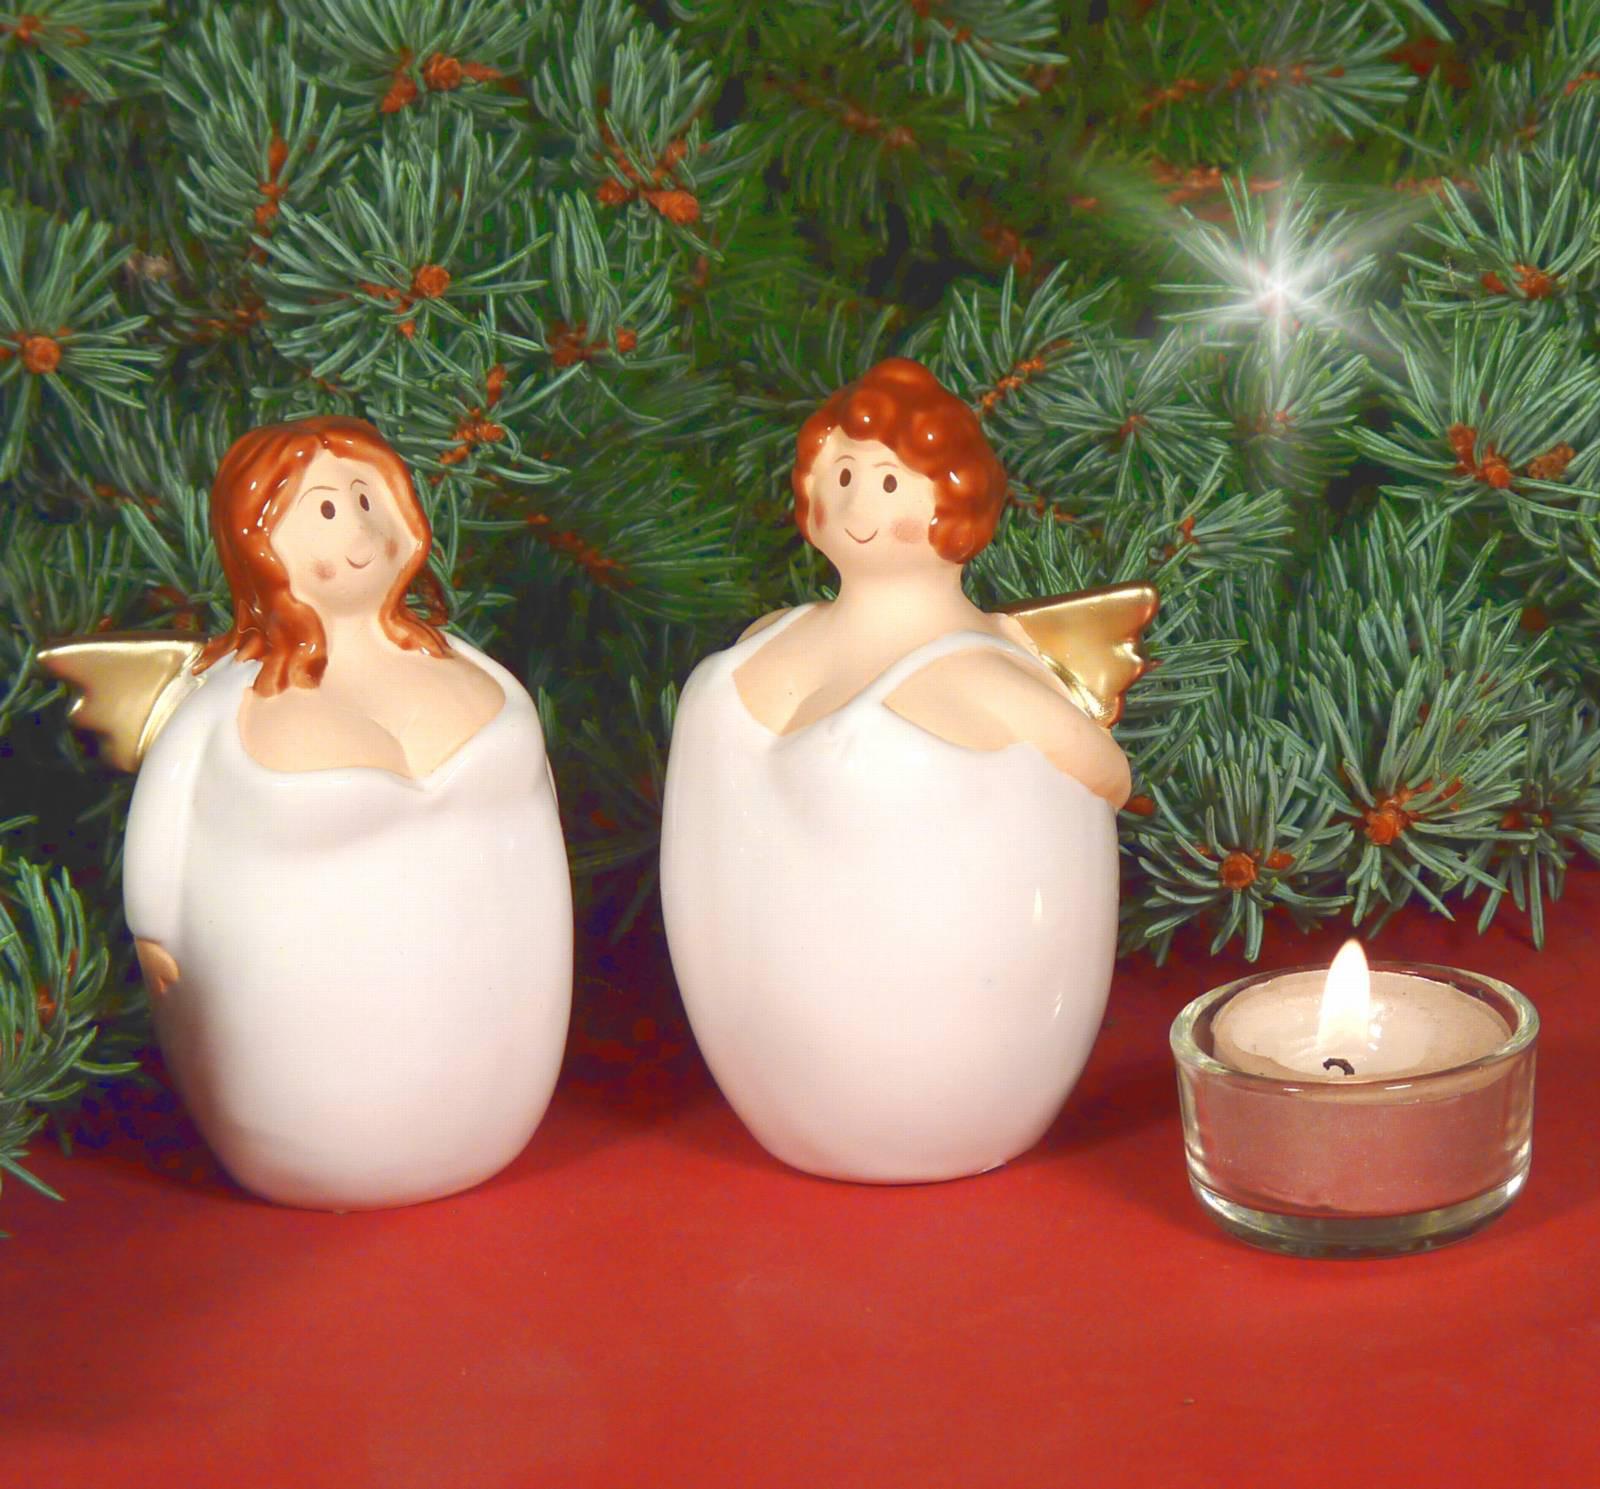 engel dicke frau keramik wei gold tischdeko weihnachtsdeko 10cm ebay. Black Bedroom Furniture Sets. Home Design Ideas